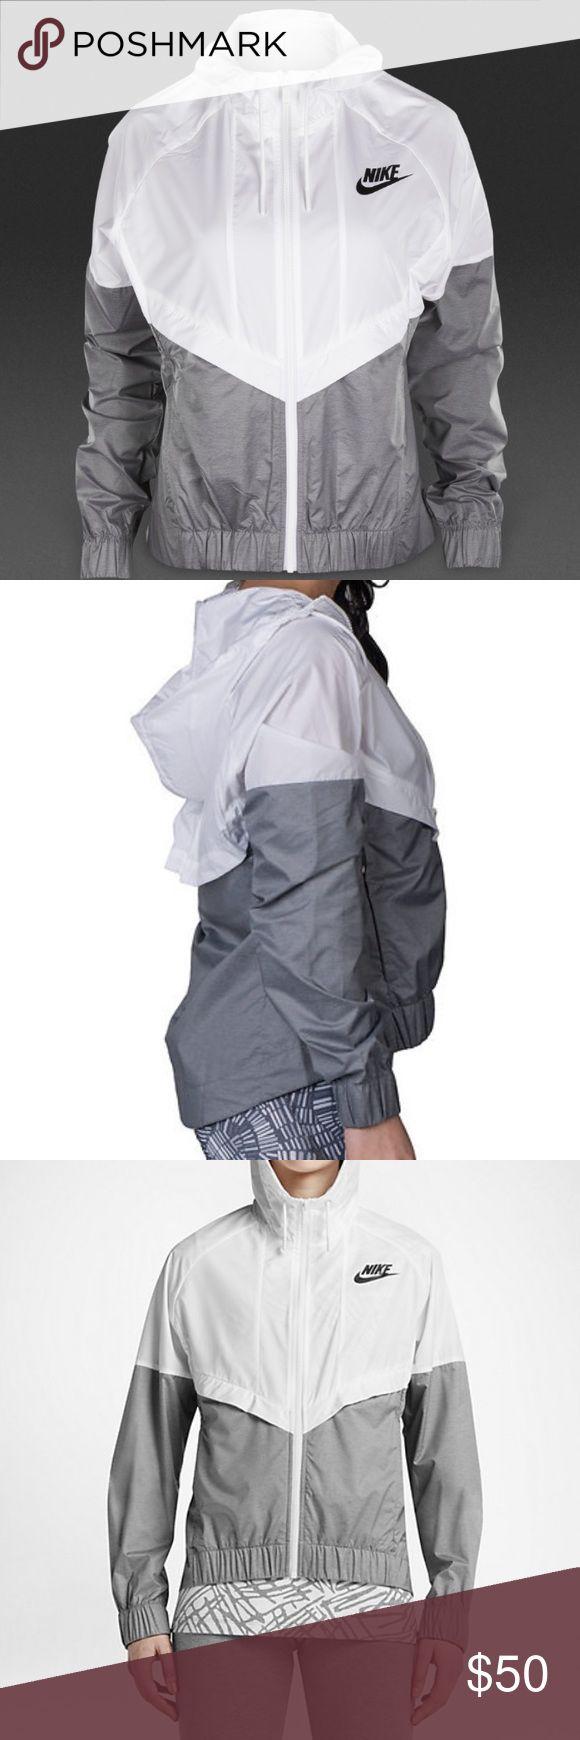 Nike Windrunner 726138 Thin Women's Jacket Nike Jackets & Coats